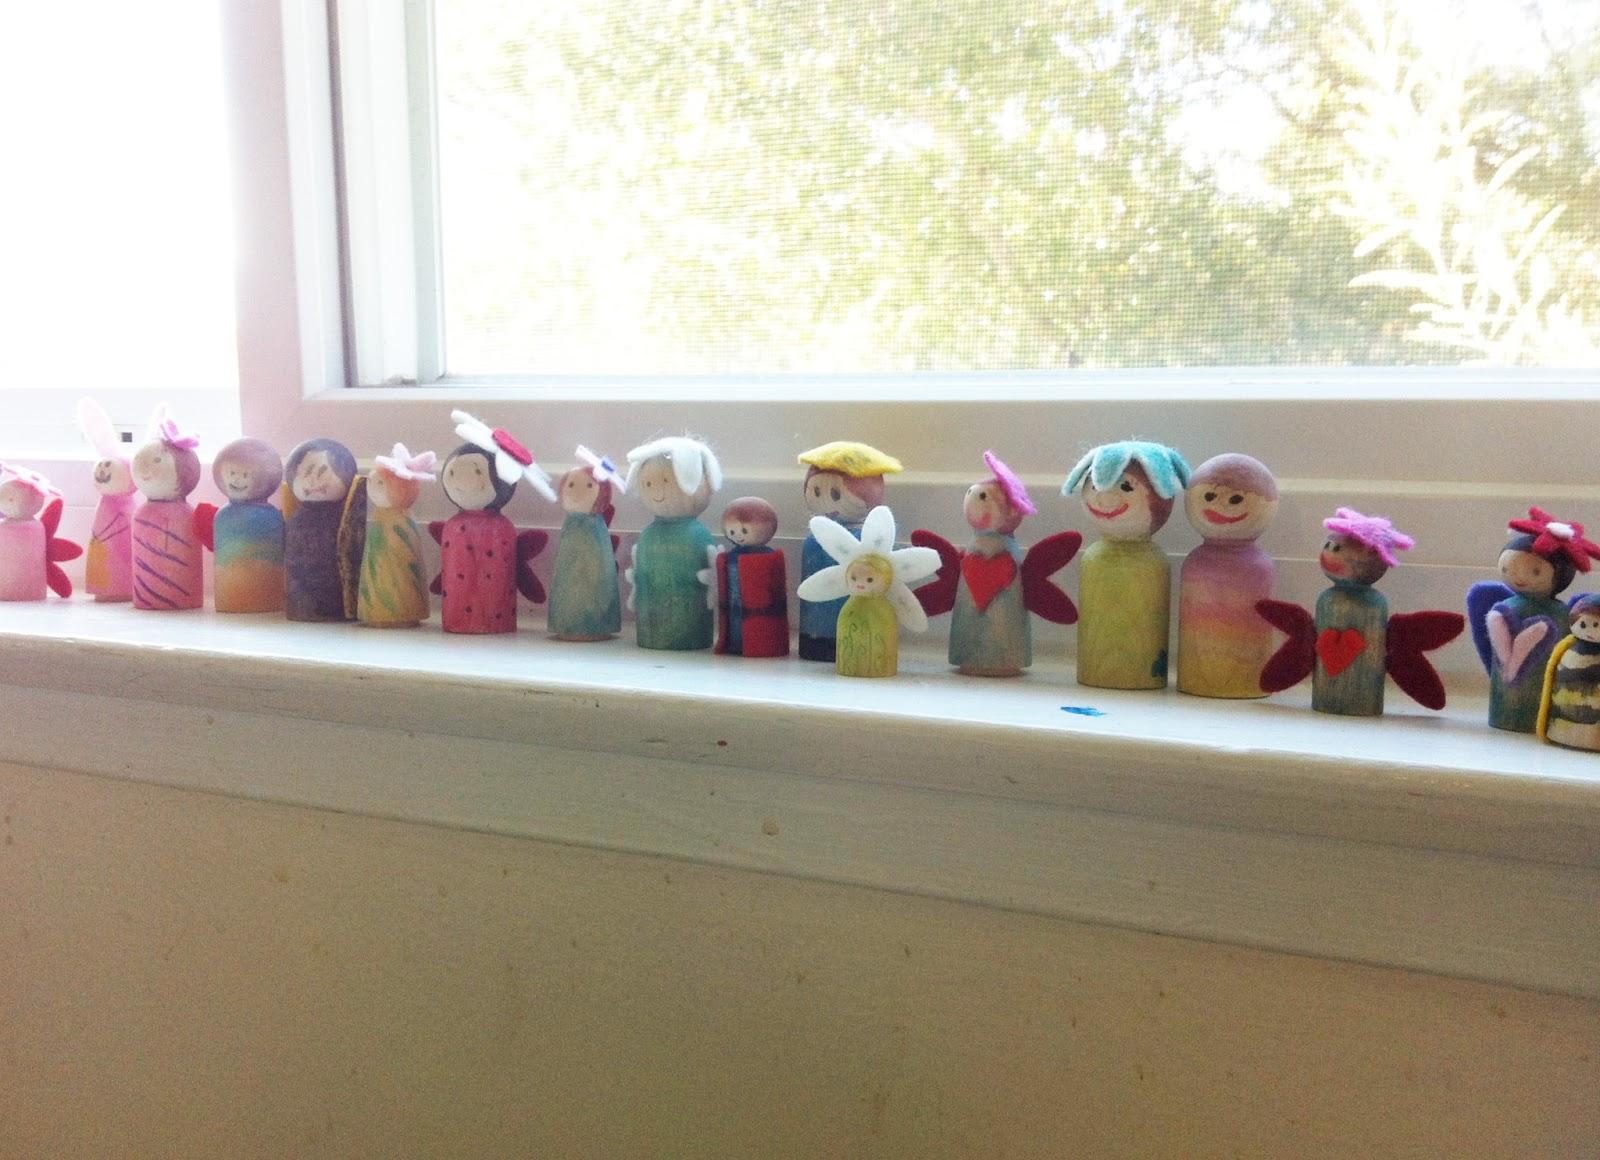 Making Peg Dolls - www.theMagicOnions.com